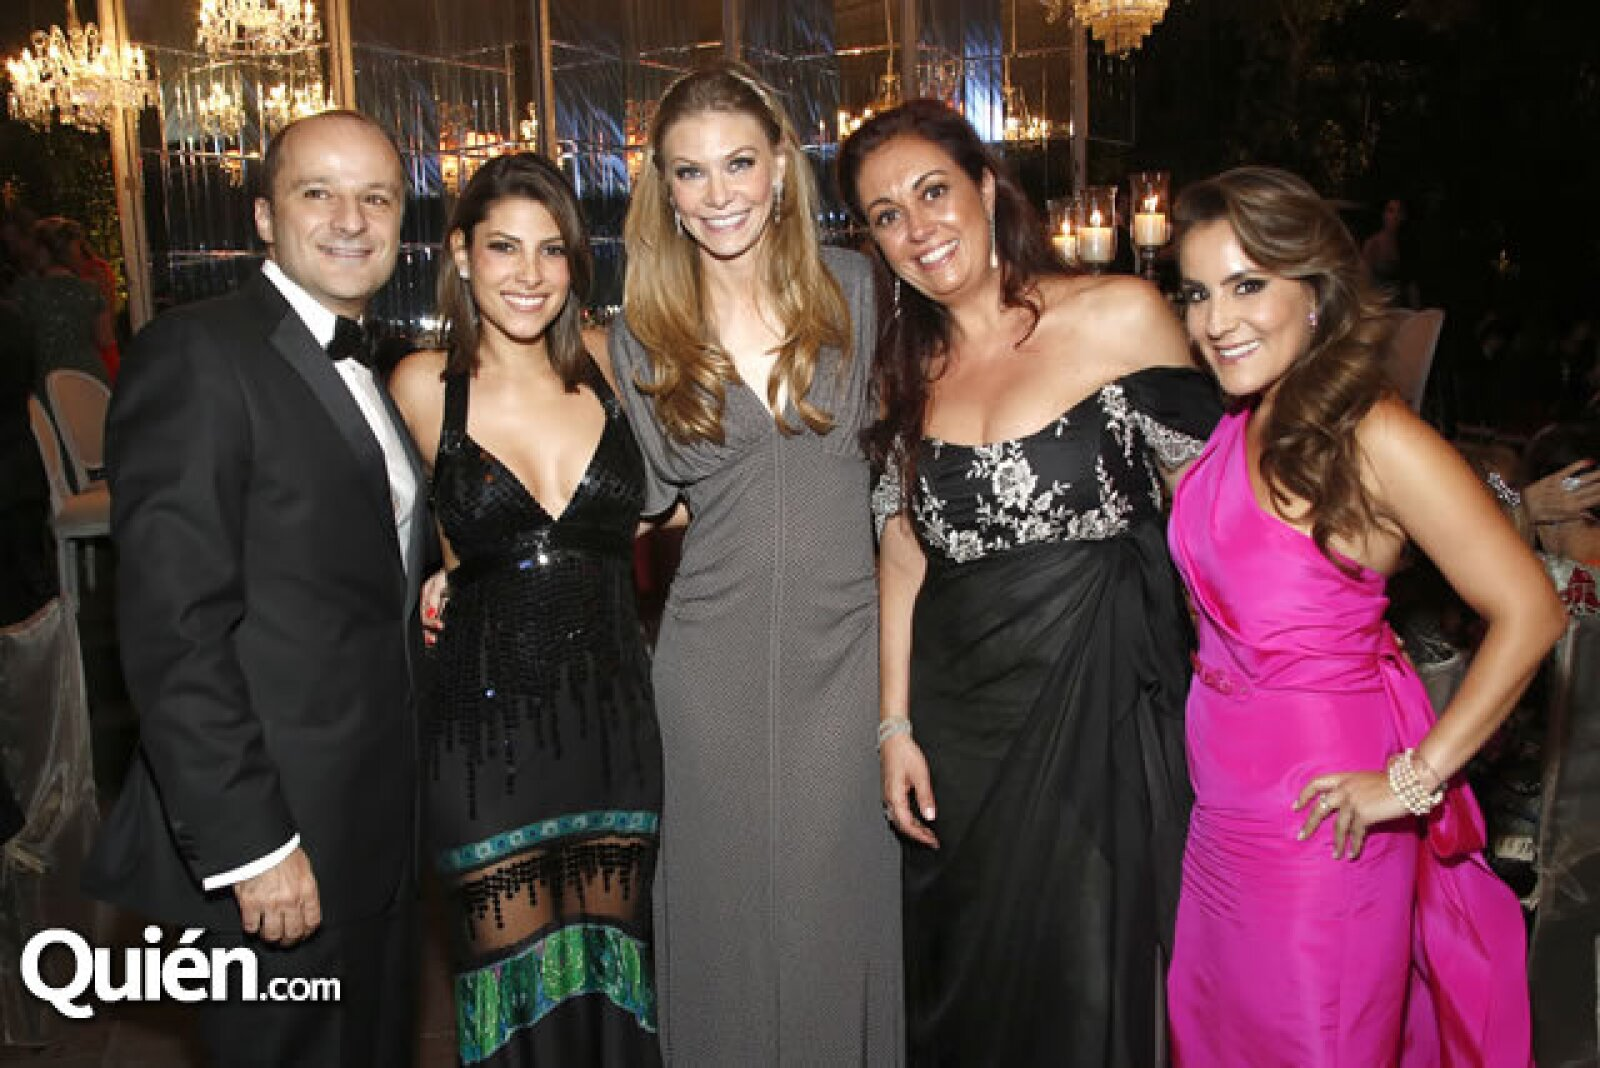 Eduardo Bejos, Sylvana Beltrones, Lili Henaine, Norma Aiza y Silvia Rojo